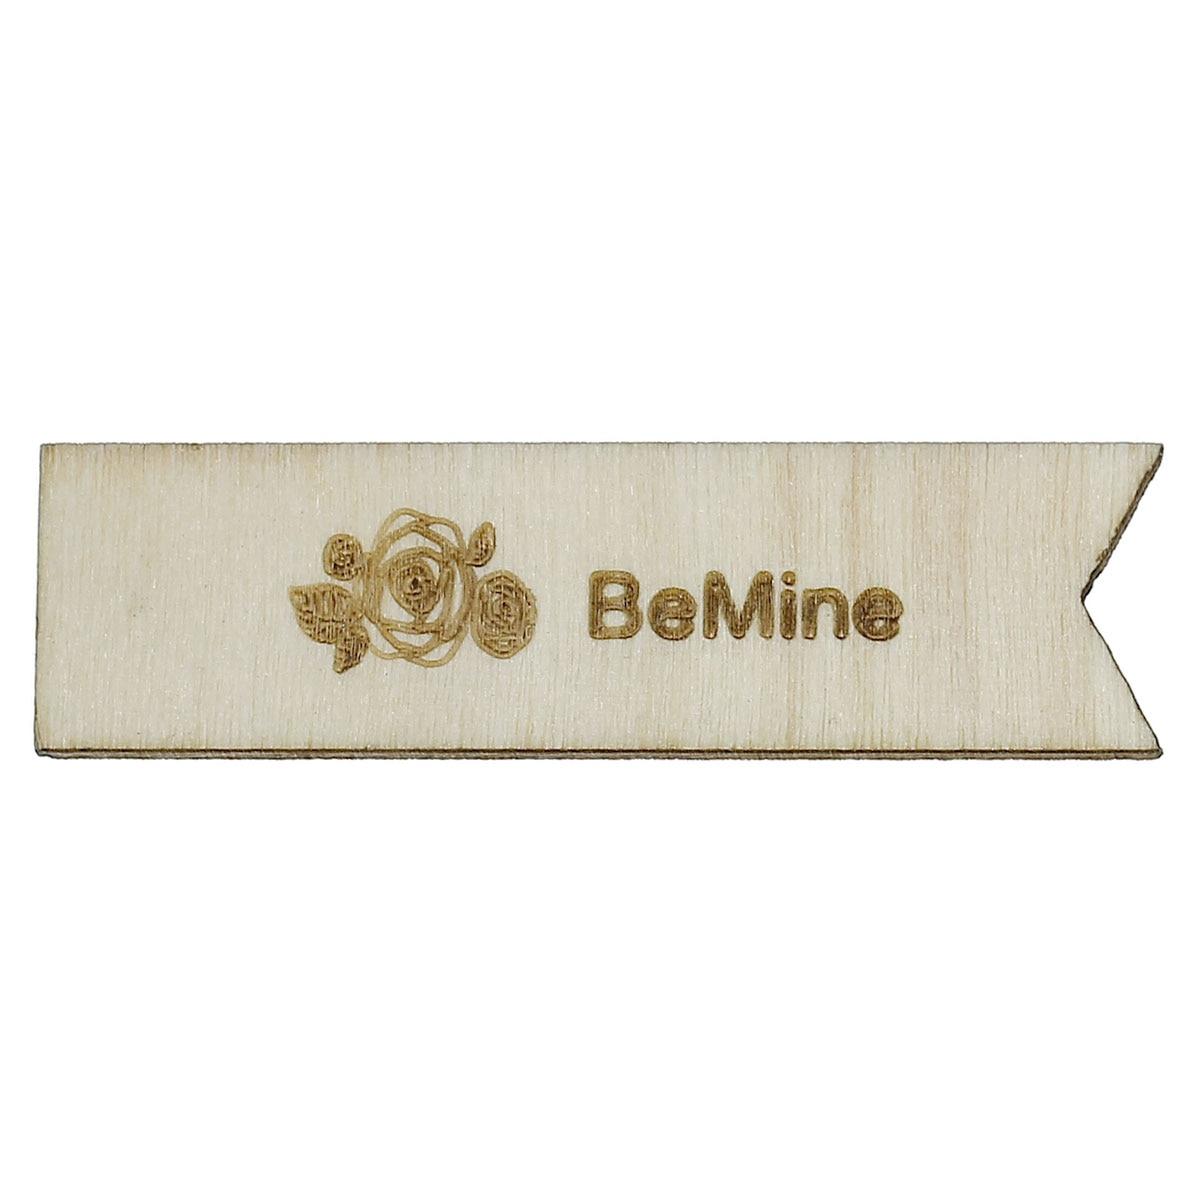 Wood Cabochons Scrapbooking Embellishments Findings Rectangle Natural MessageBeMineRose Flower 53mm x 15mm,50 PCs 2015 new